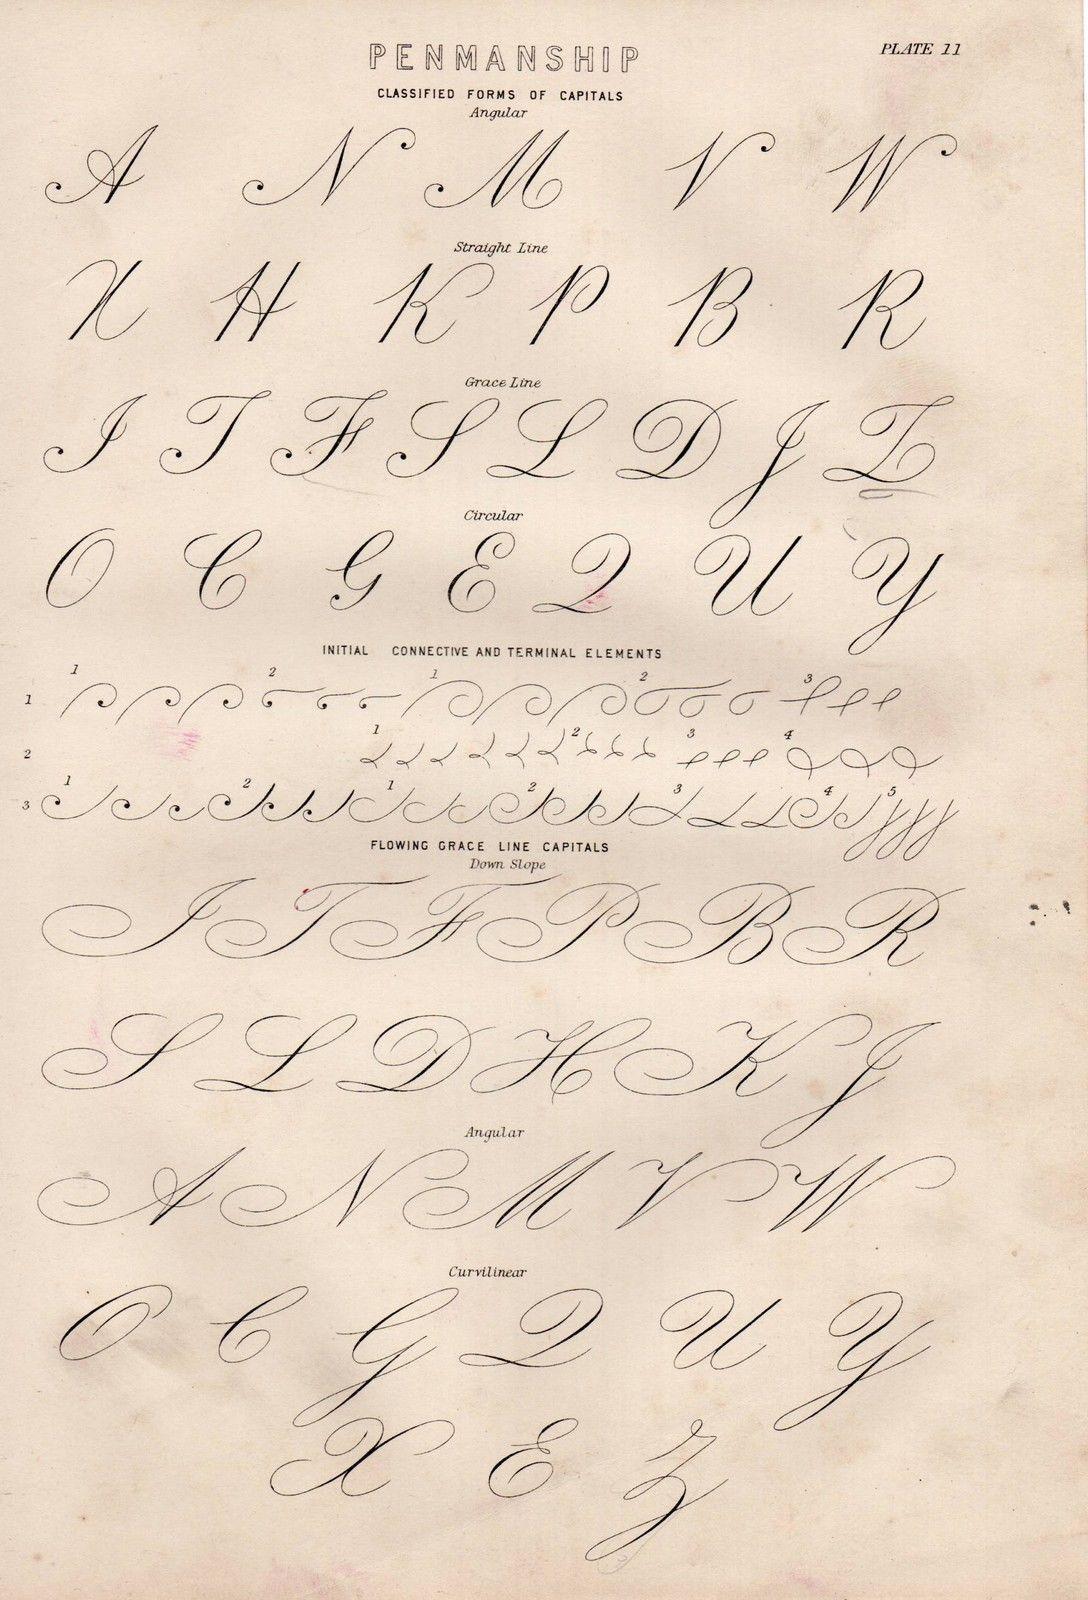 1886 Print Penmanship Classified Forms Of Capitals Angular Grace Curvilinear Handwriting Analysis Handwriting Writing Worksheets [ 1600 x 1088 Pixel ]